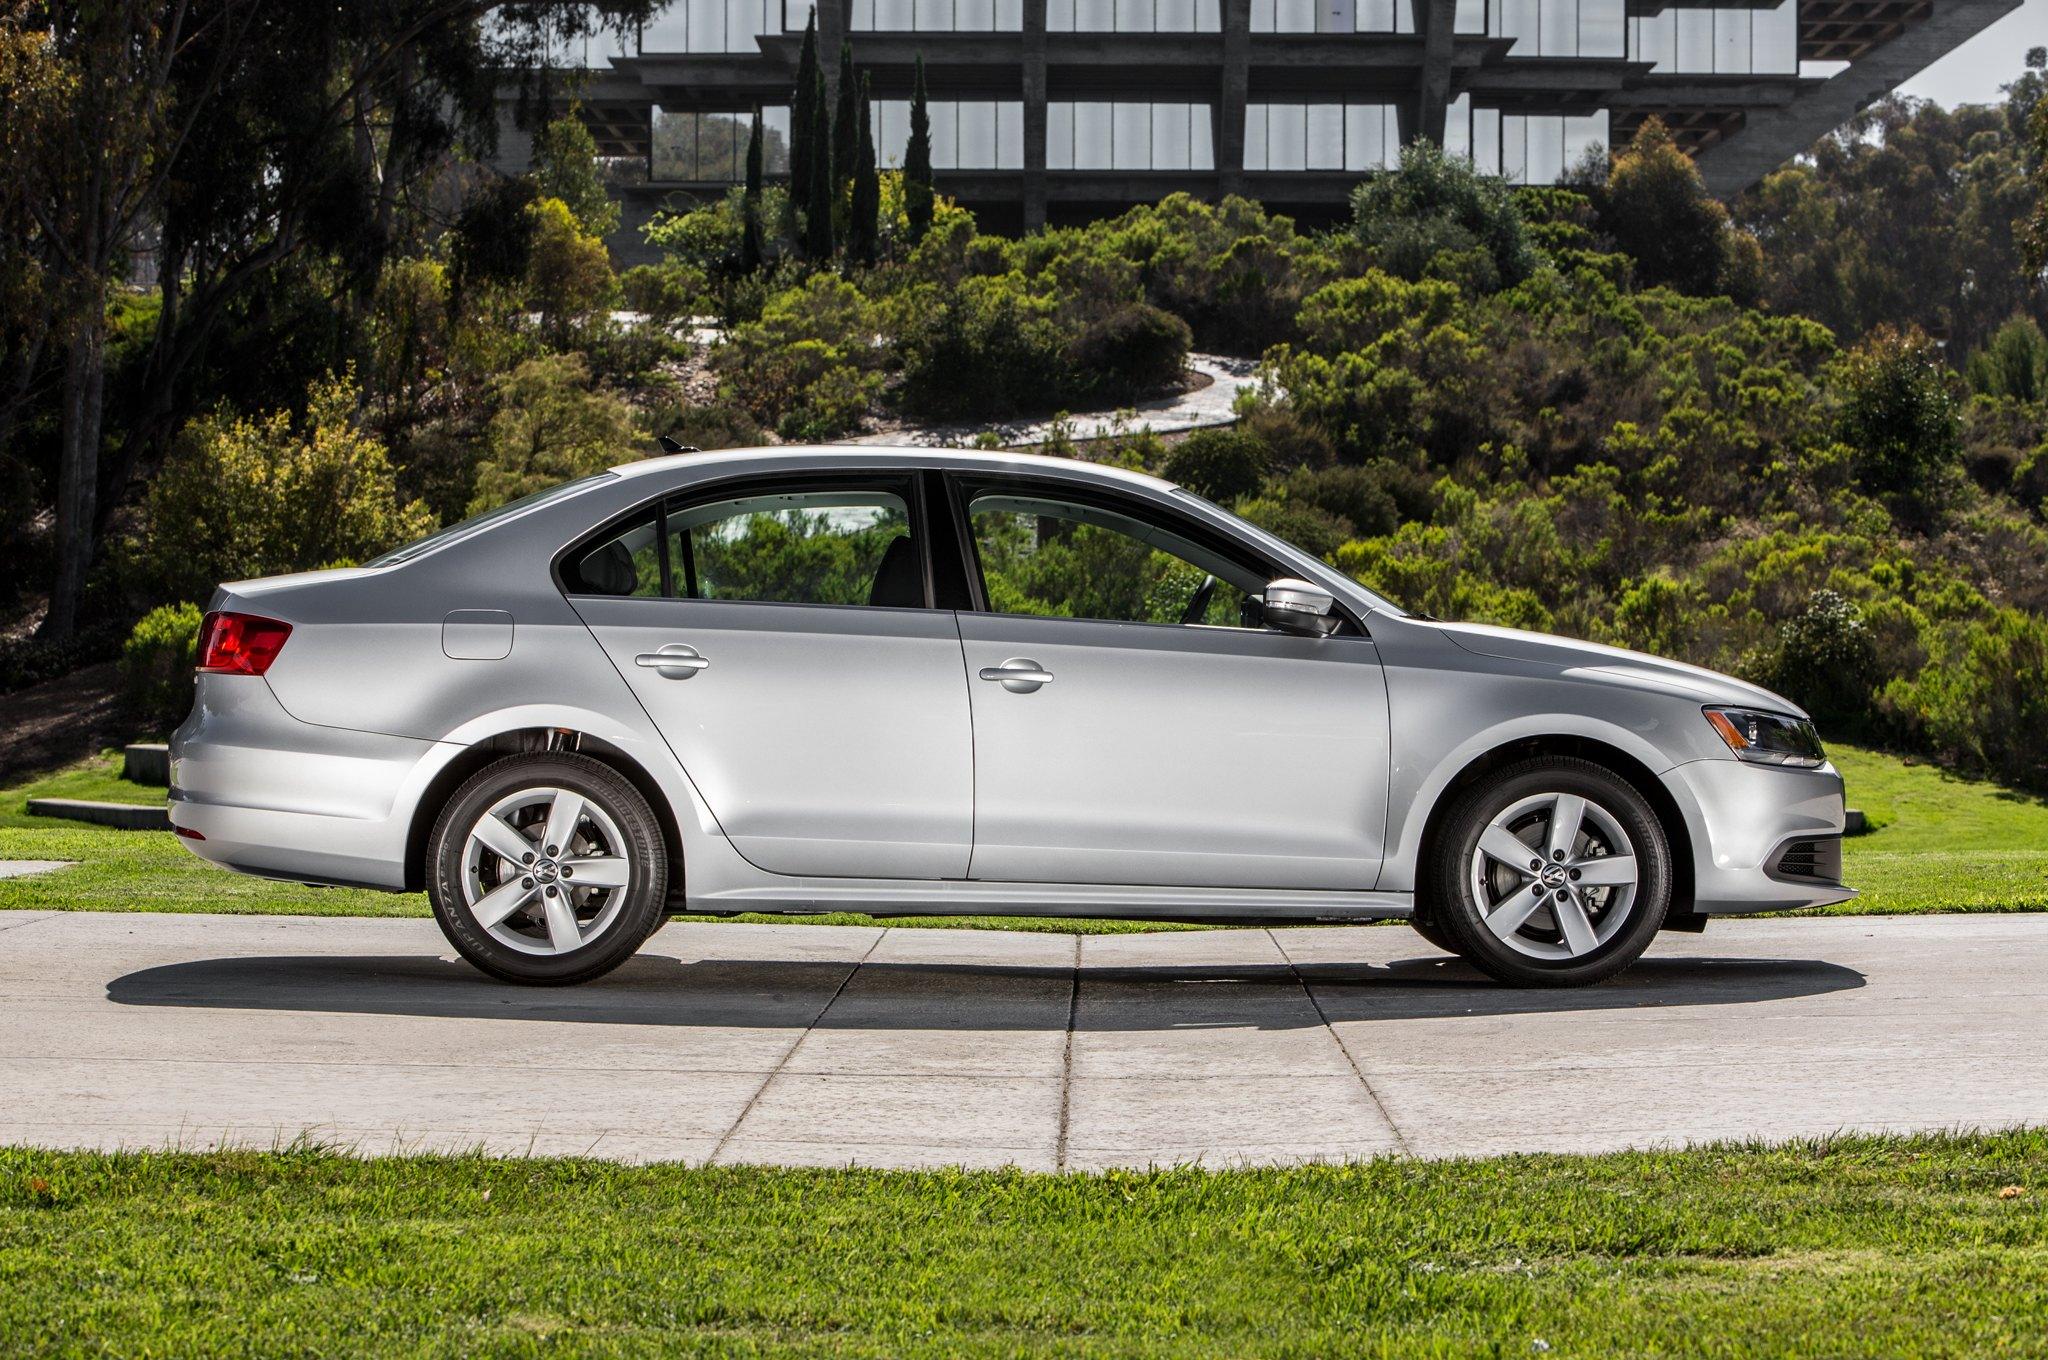 photo sedan jetta volkswagen vehicle for in details tdi sale value tx edition houston